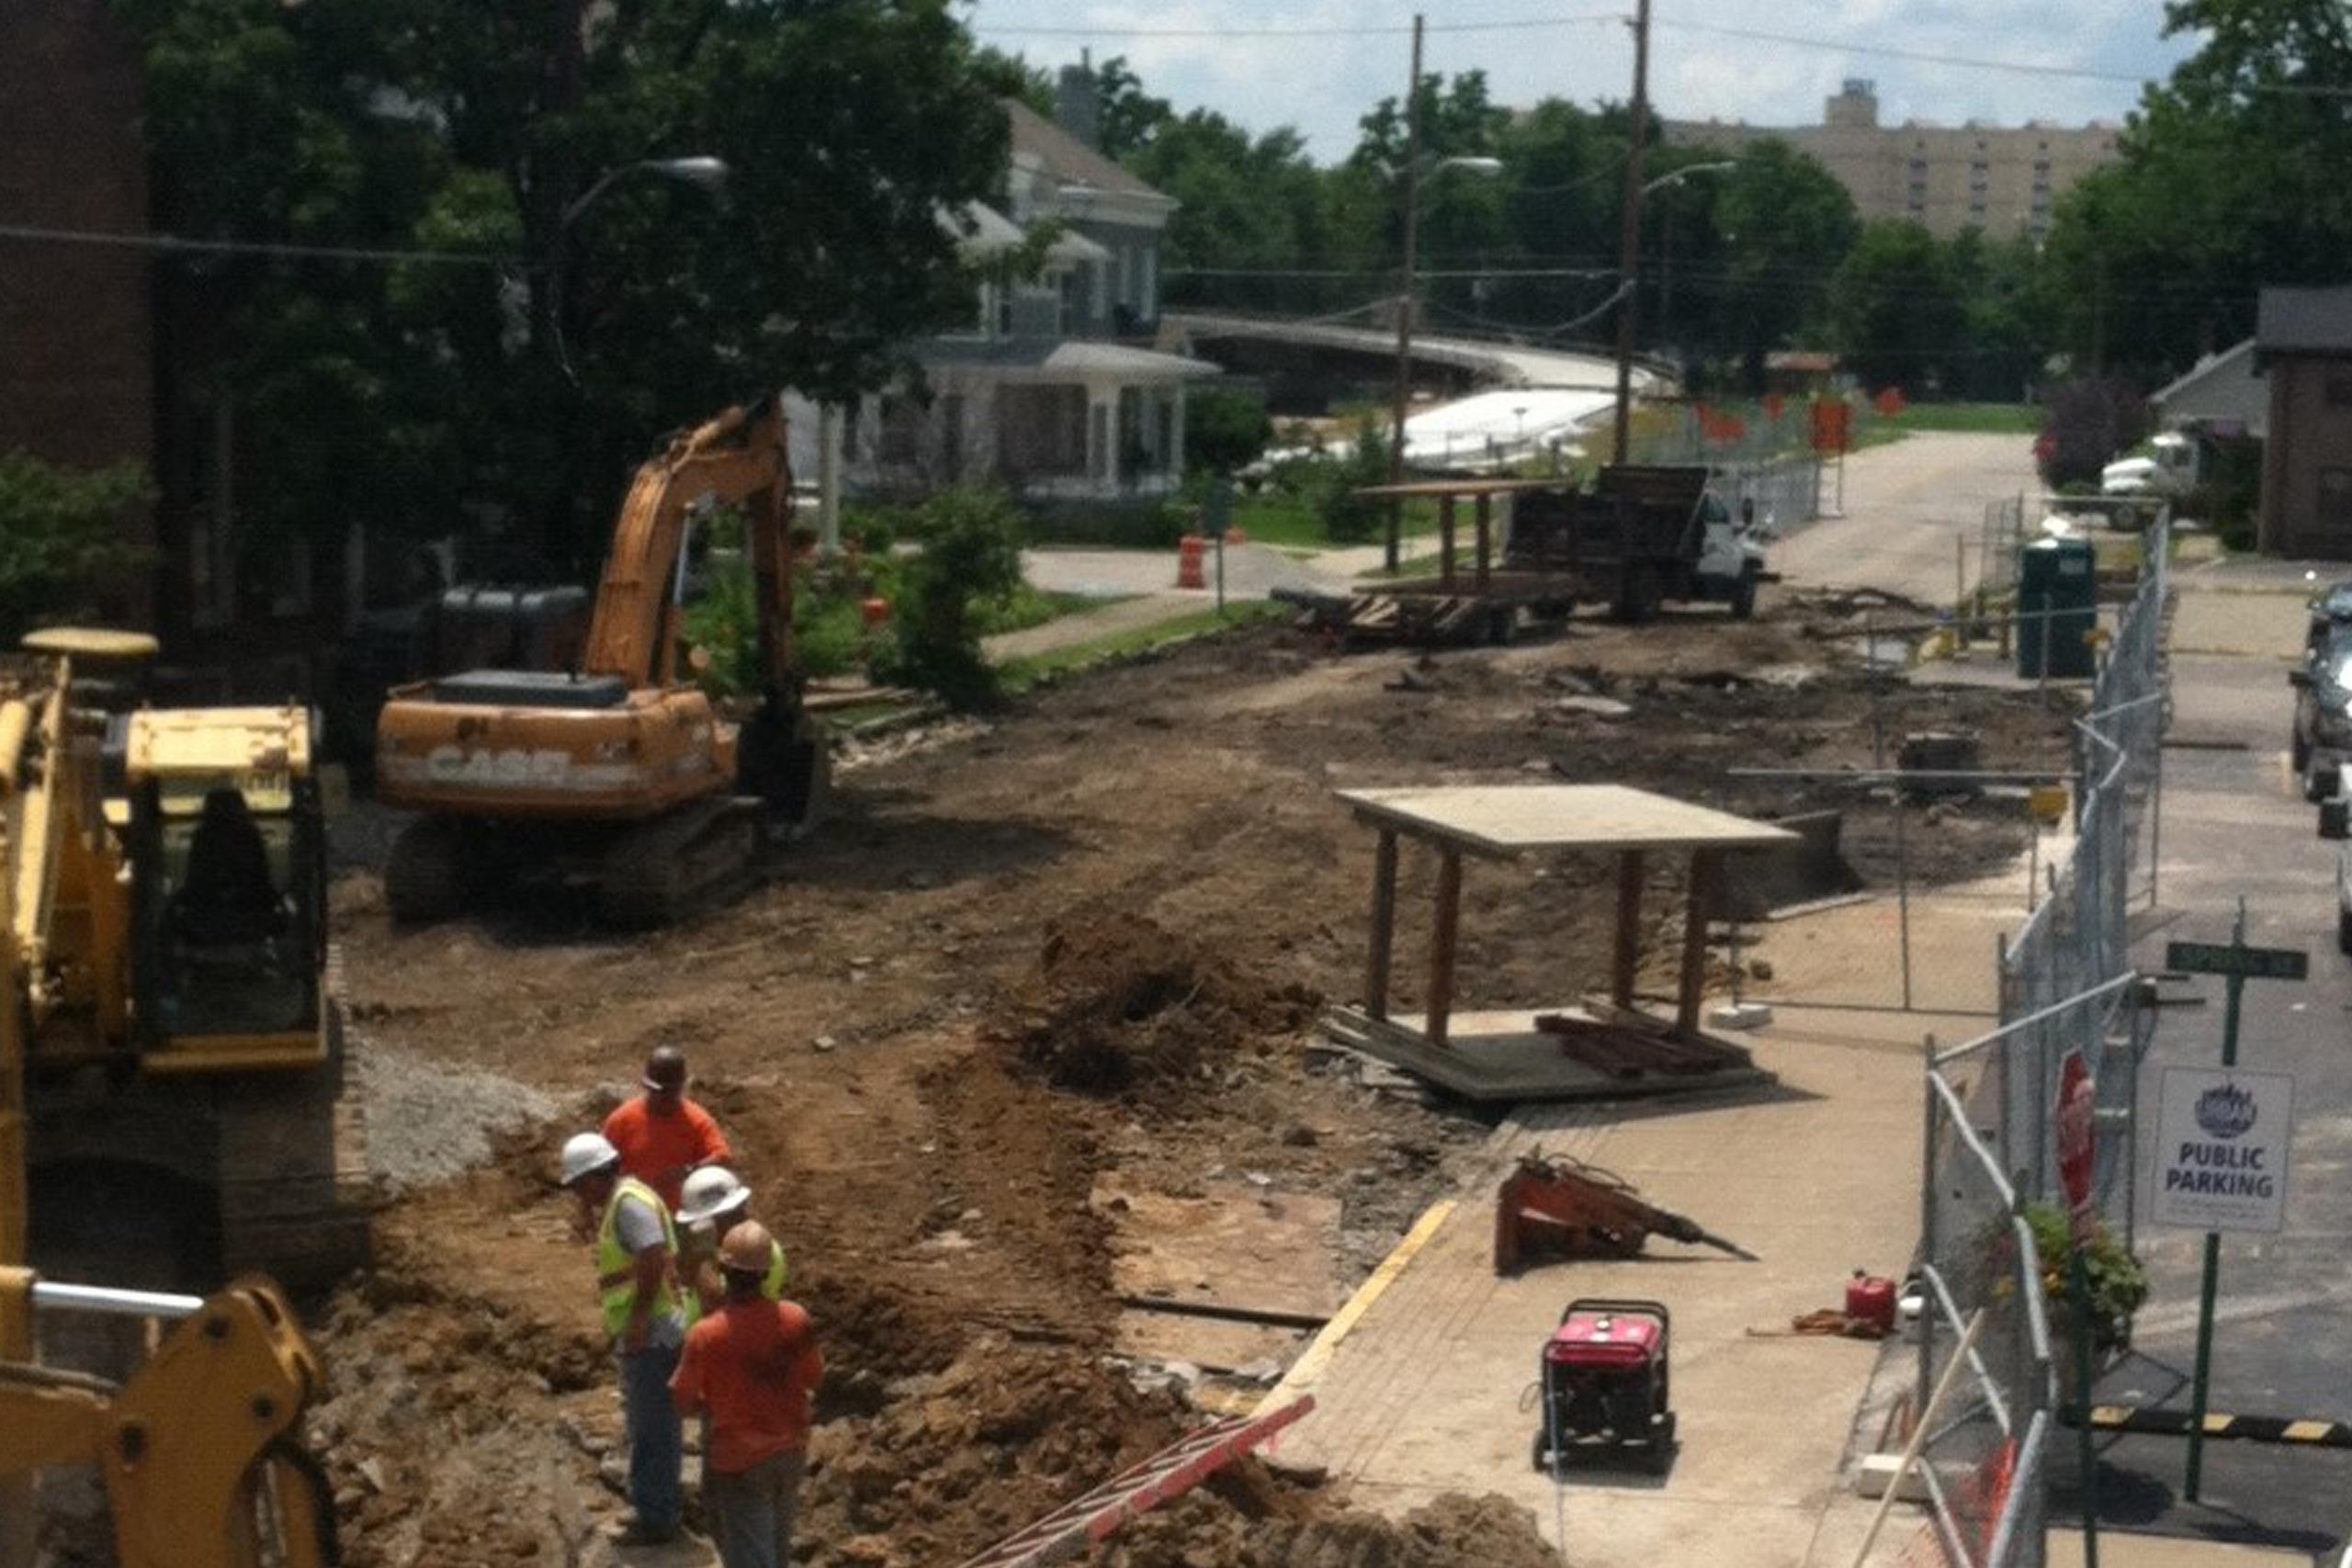 Chestnut Street Jeffersonville (during construction)